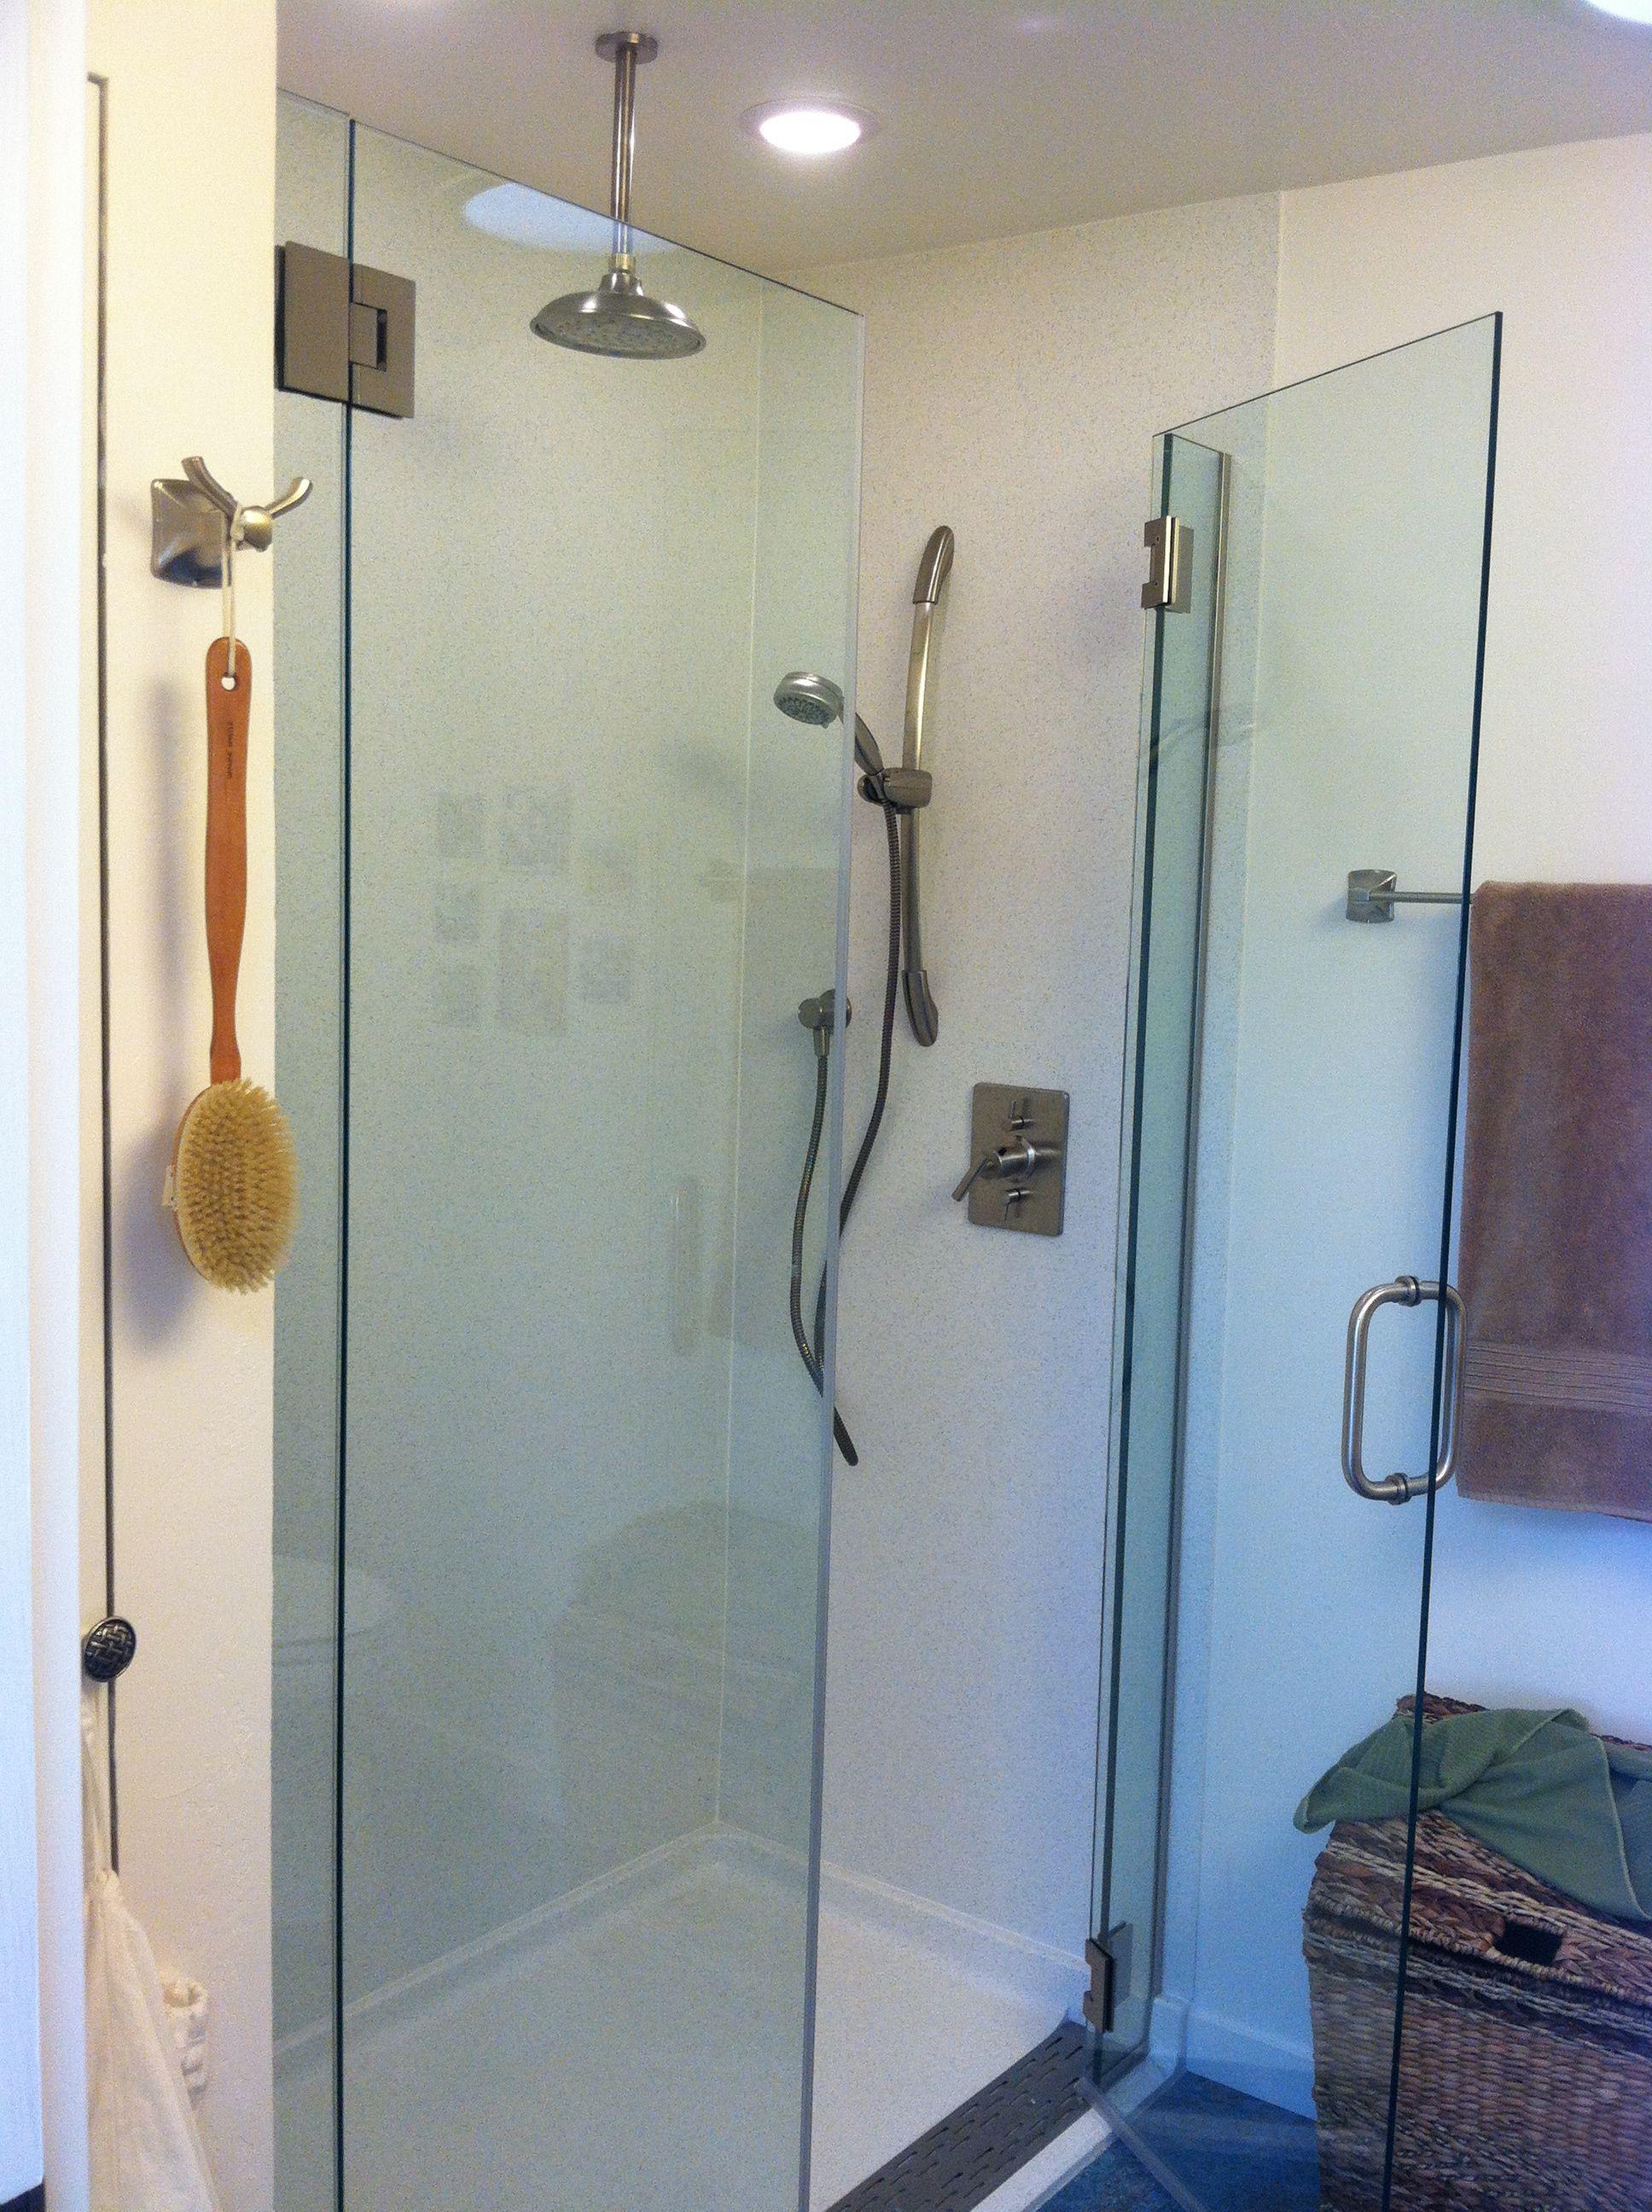 Master bathroom shower; thick frameless glass, rain head, and lights.